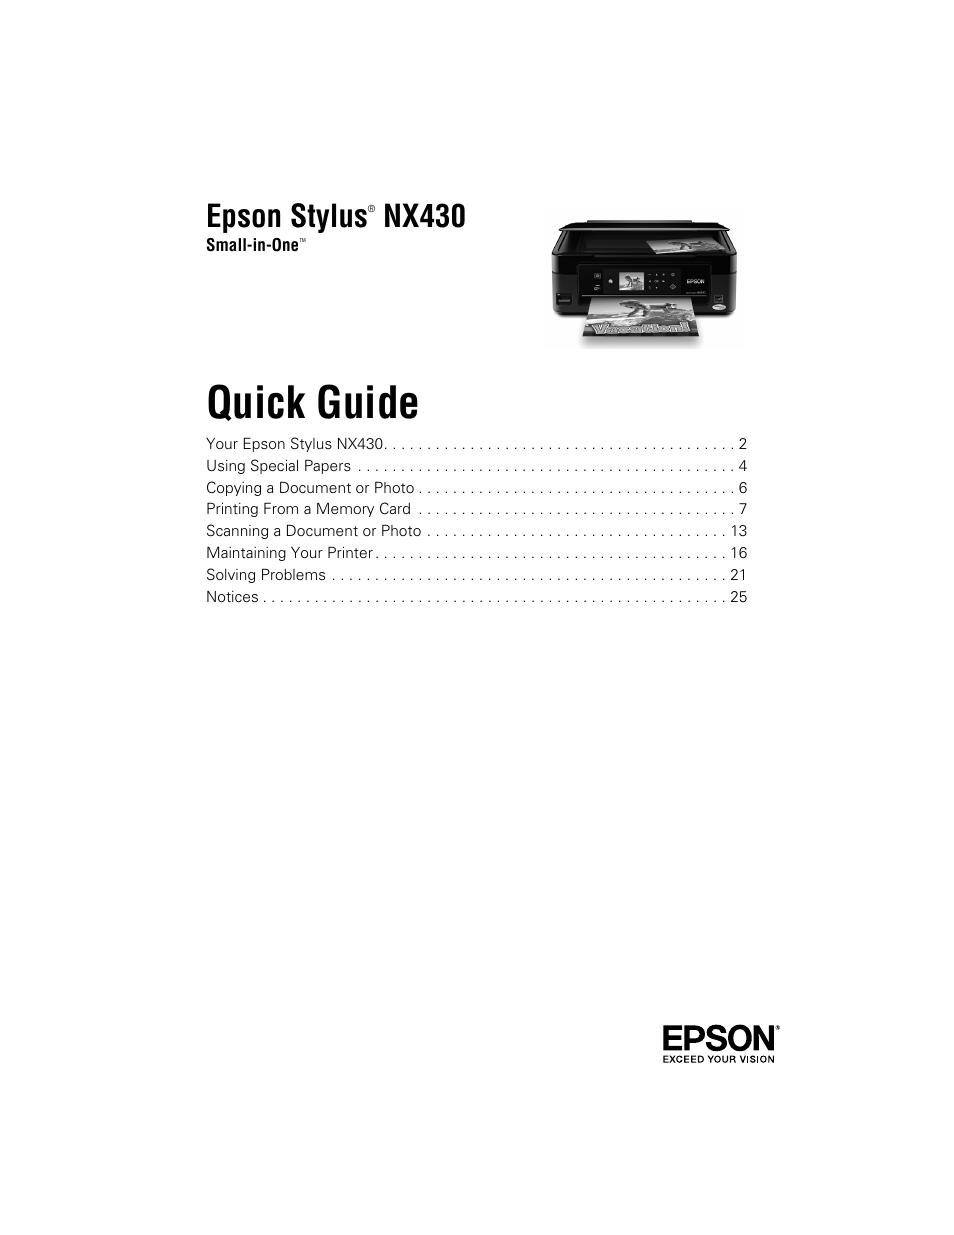 epson nx430 user manual 32 pages rh manualsdir com epson nx420 user guide Epson NX430 Ink